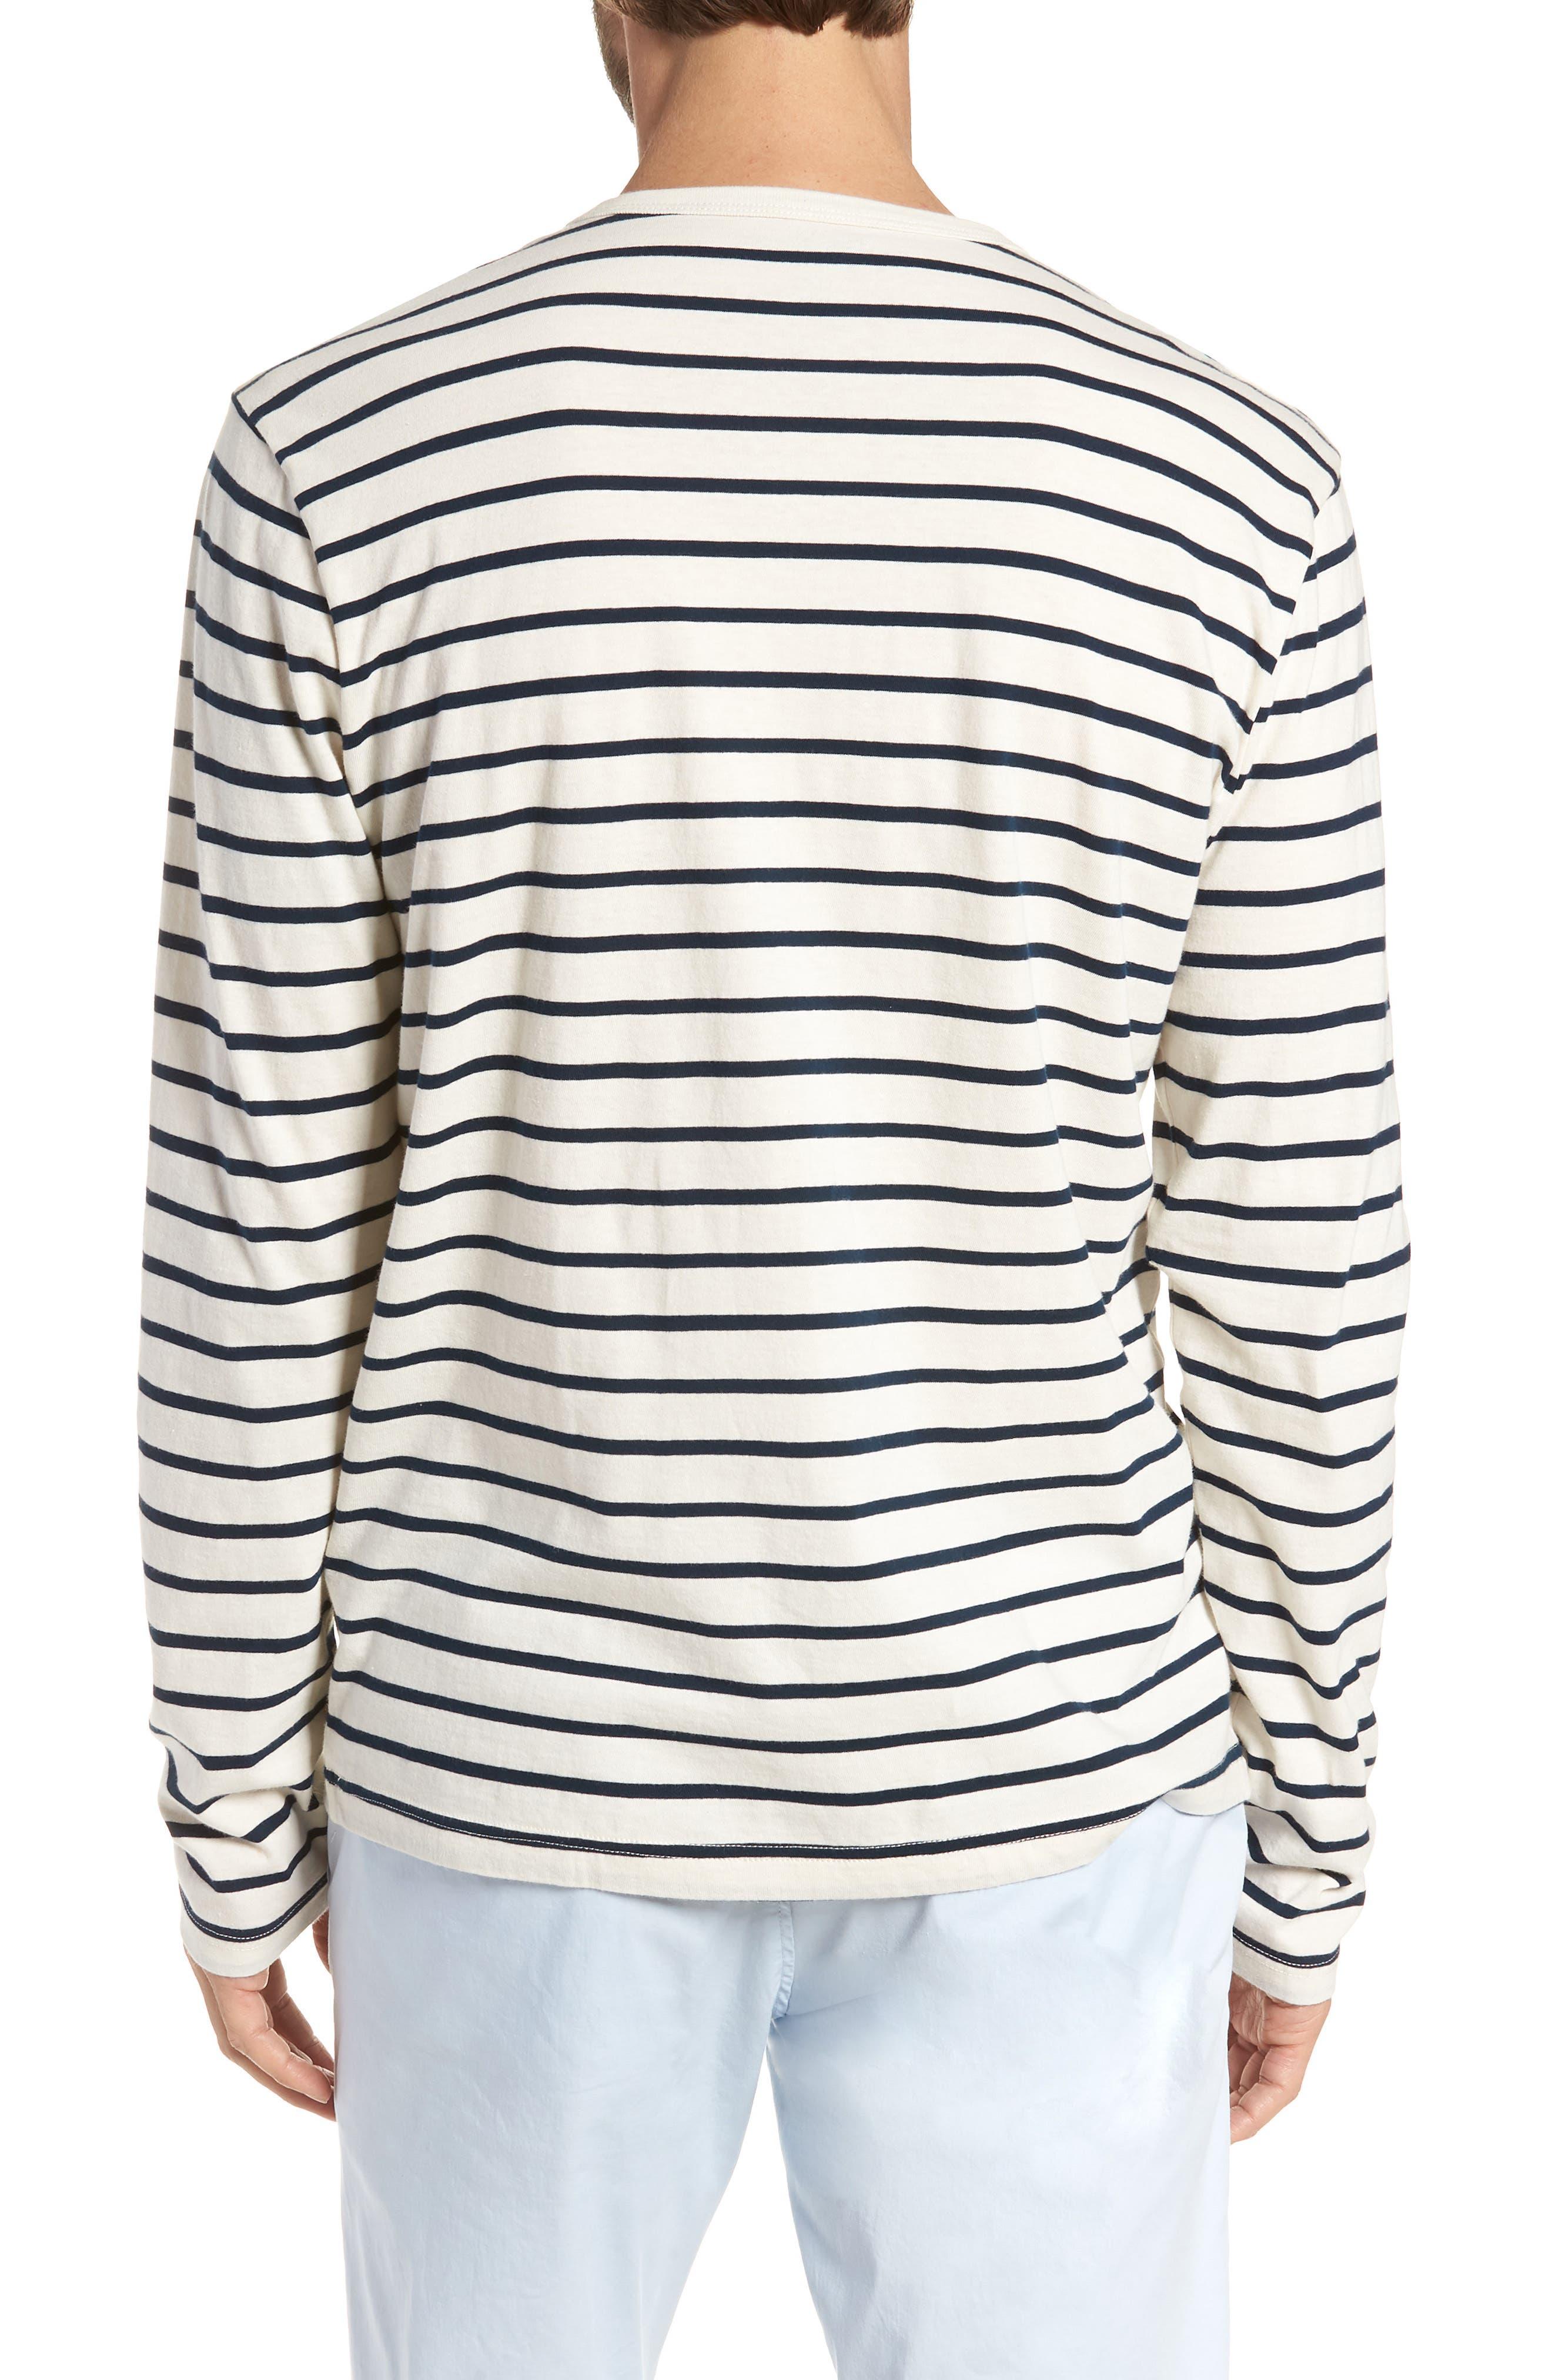 Mercantile Stripe Long Sleeve T-Shirt,                             Alternate thumbnail 2, color,                             Mountain White